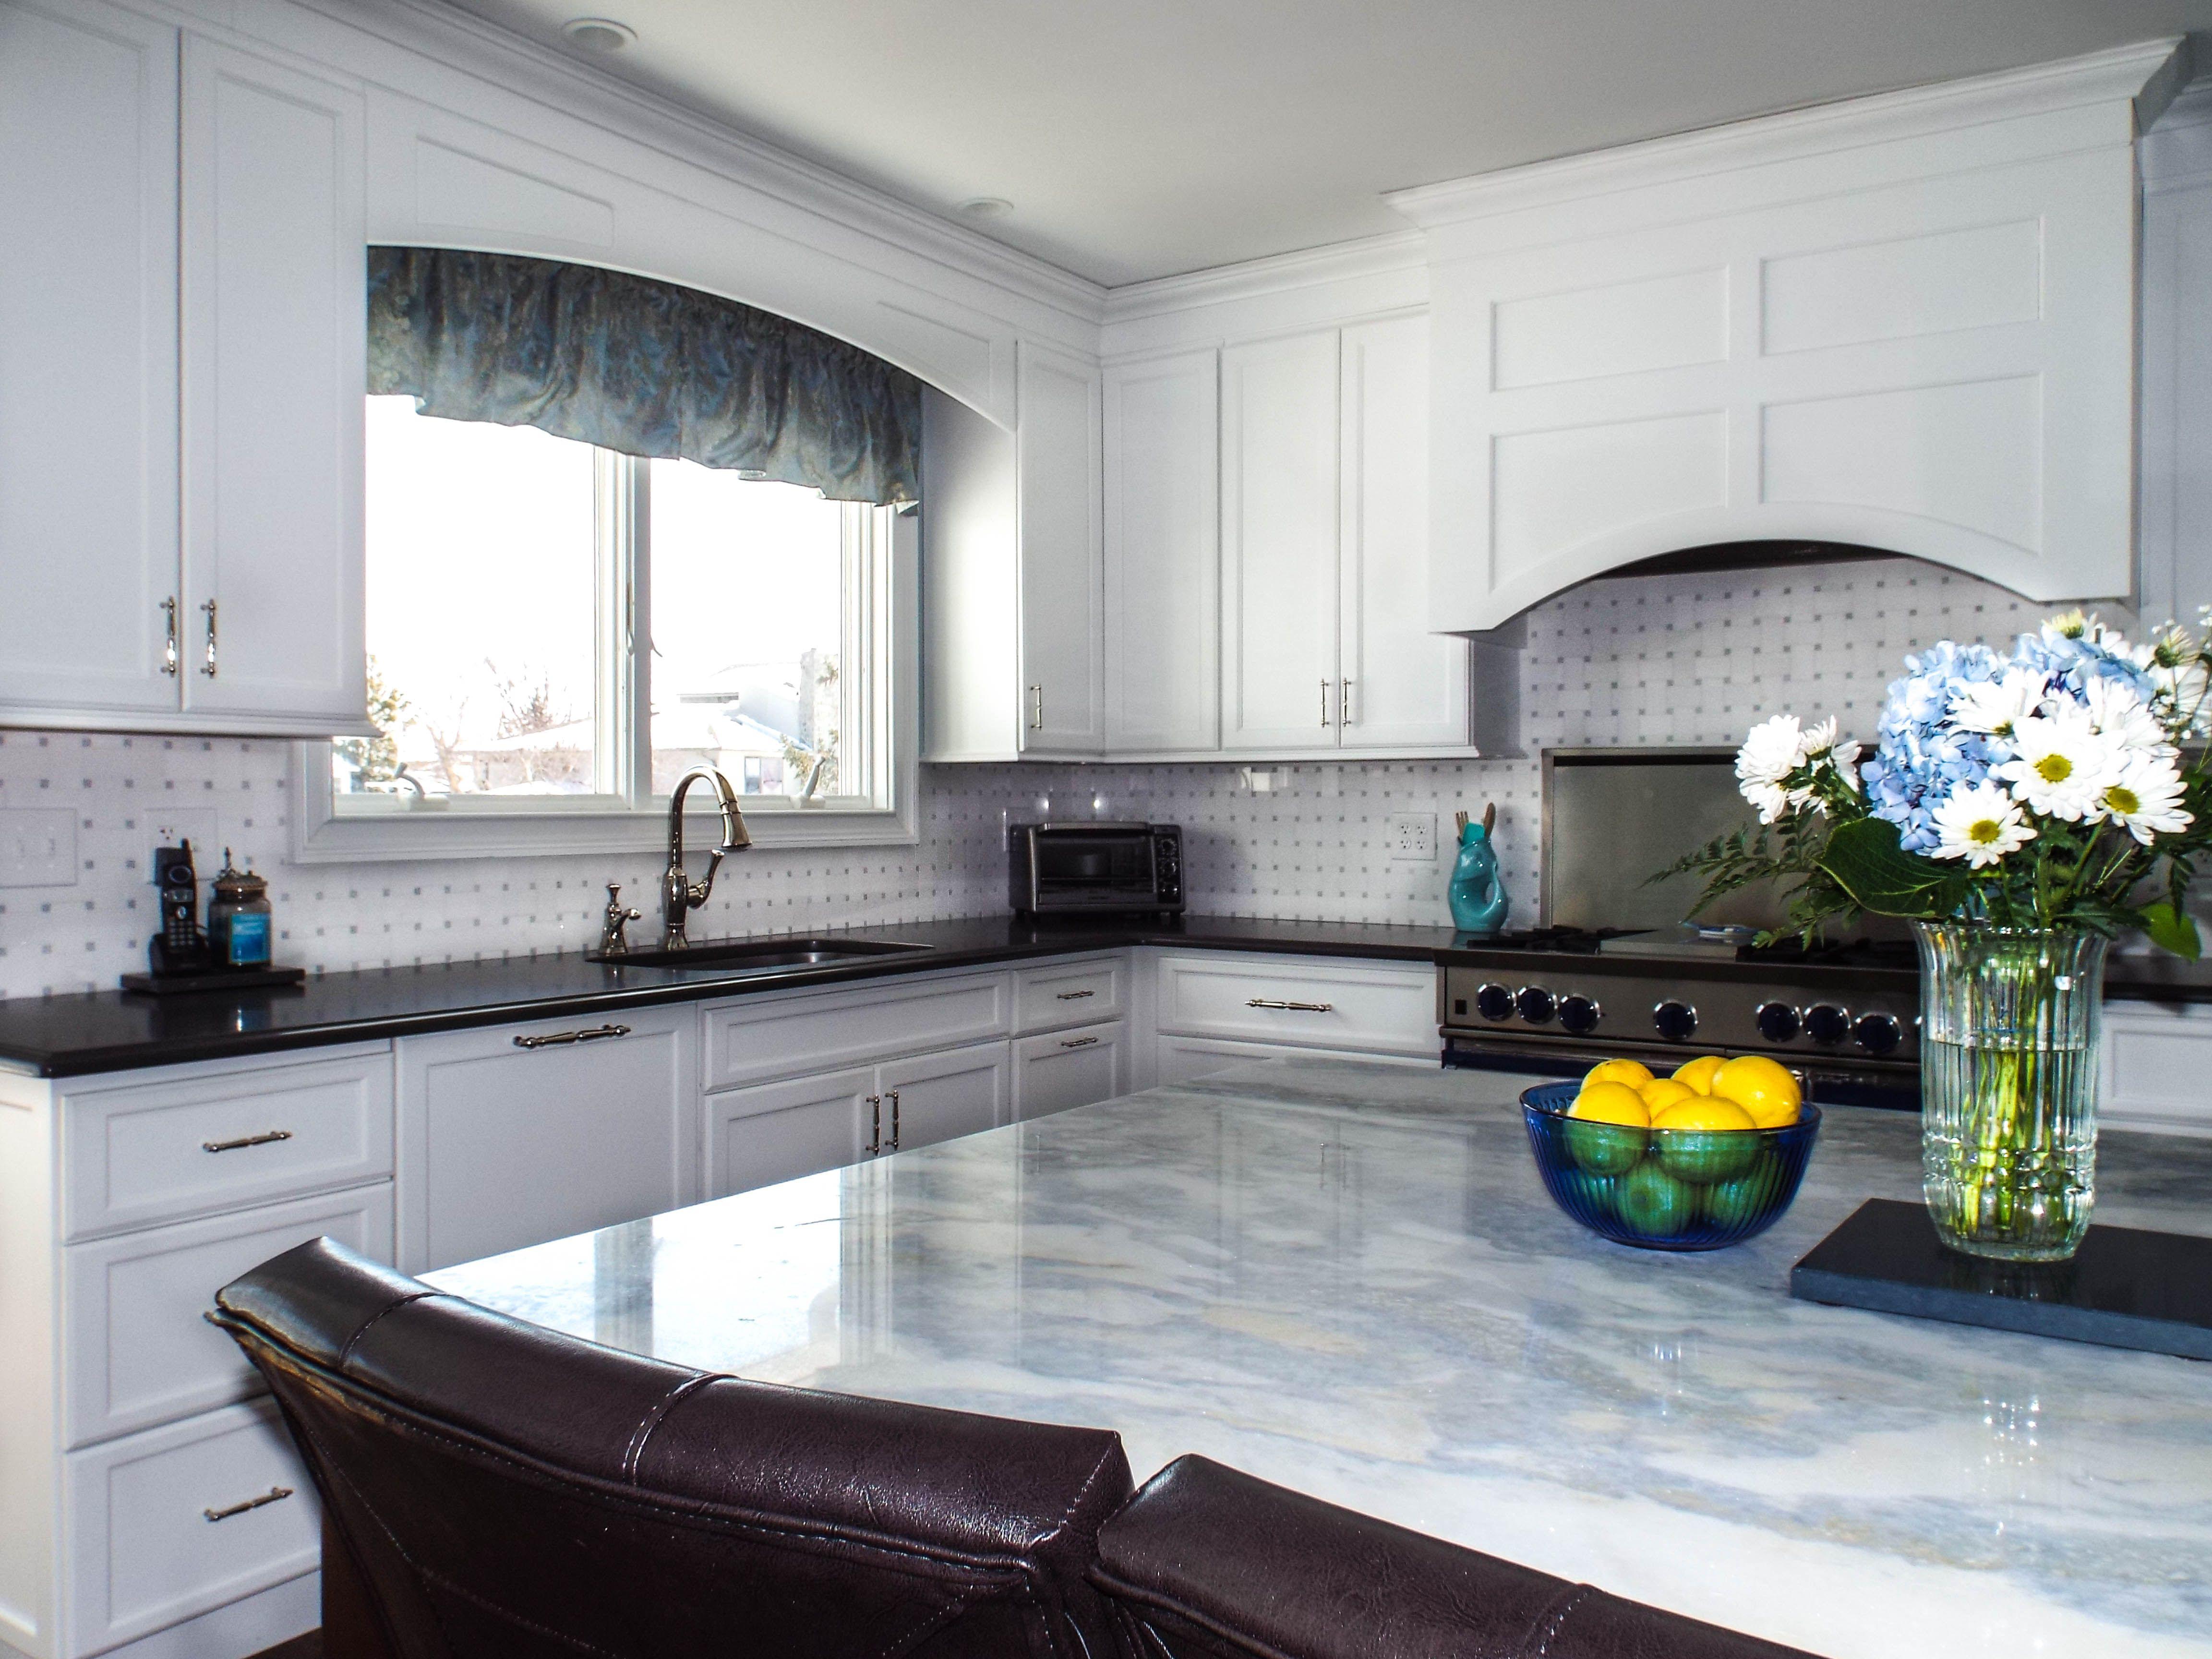 Island Counter-top   Countertops, Kitchen design, Kitchen ...